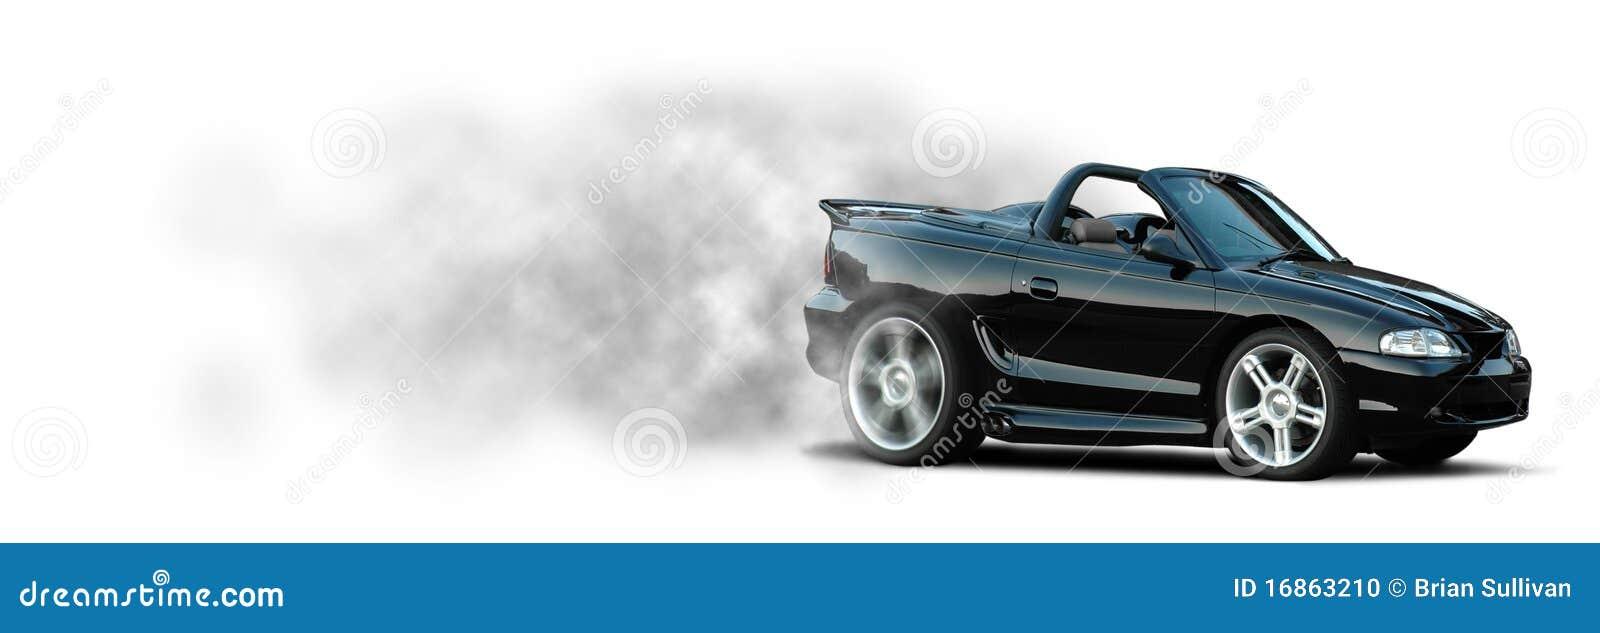 Sports Car Burnout Mustang Stock Photo Image 16863210